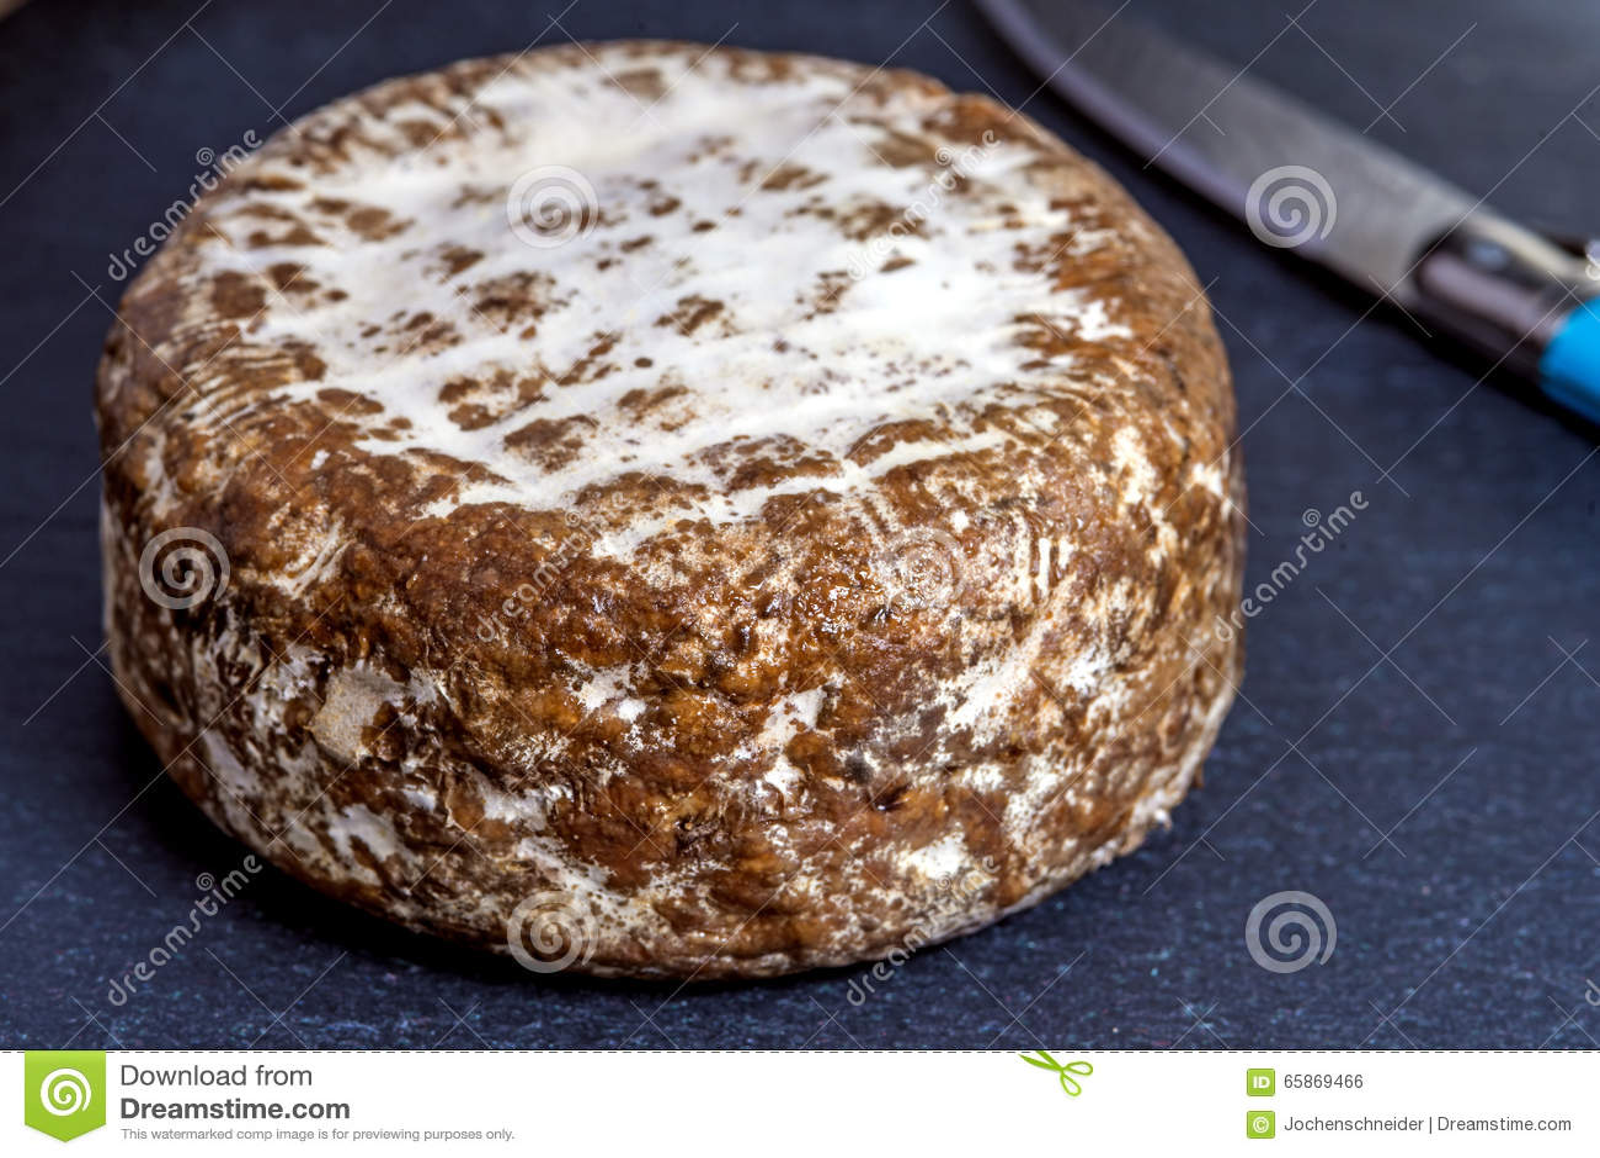 Tomette des Alpes, τυρί της Γαλλίας